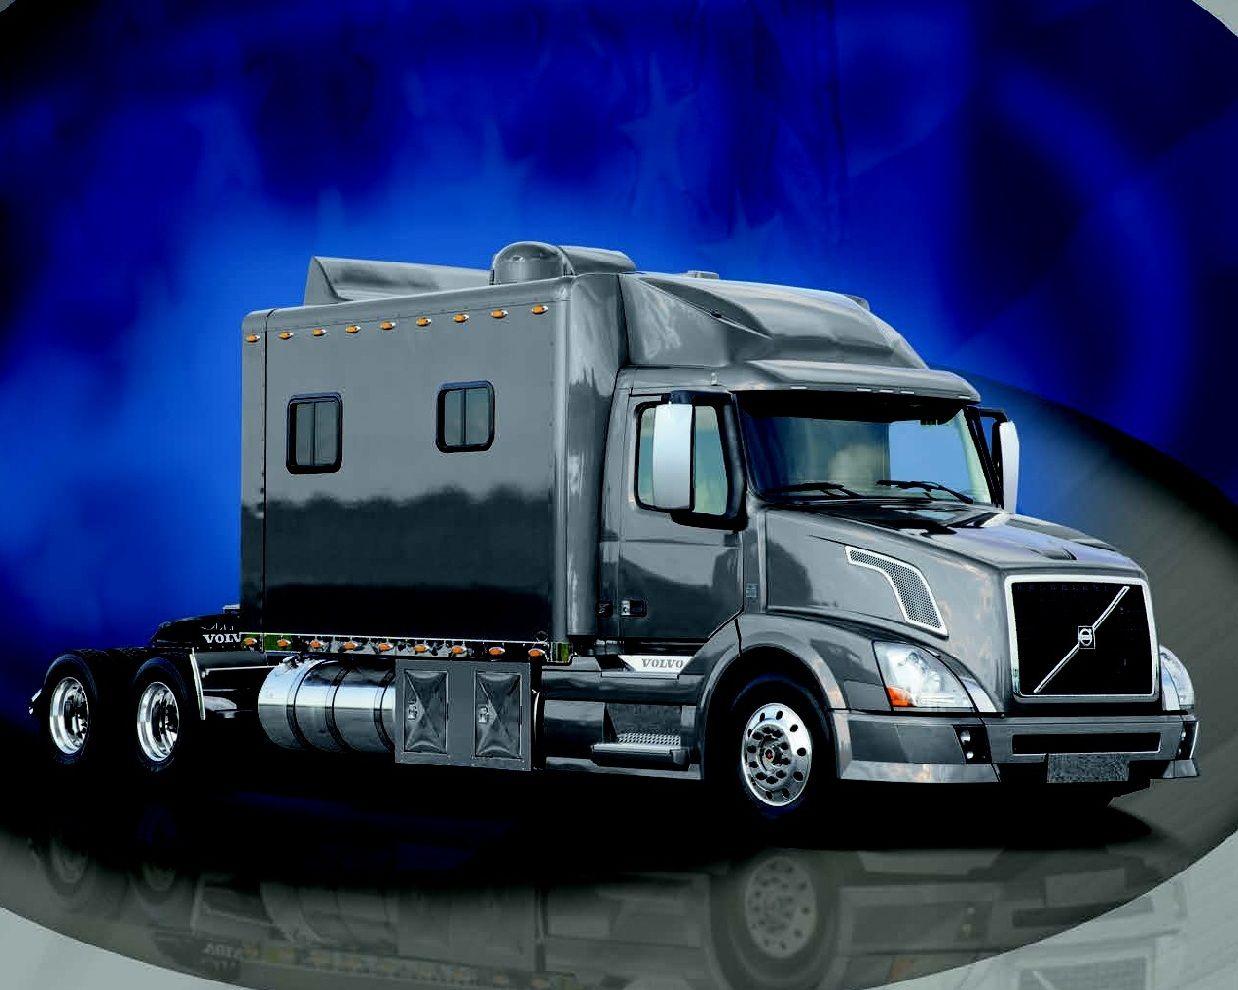 Legacy sleepers ari american reliance industries co semi trucksbig